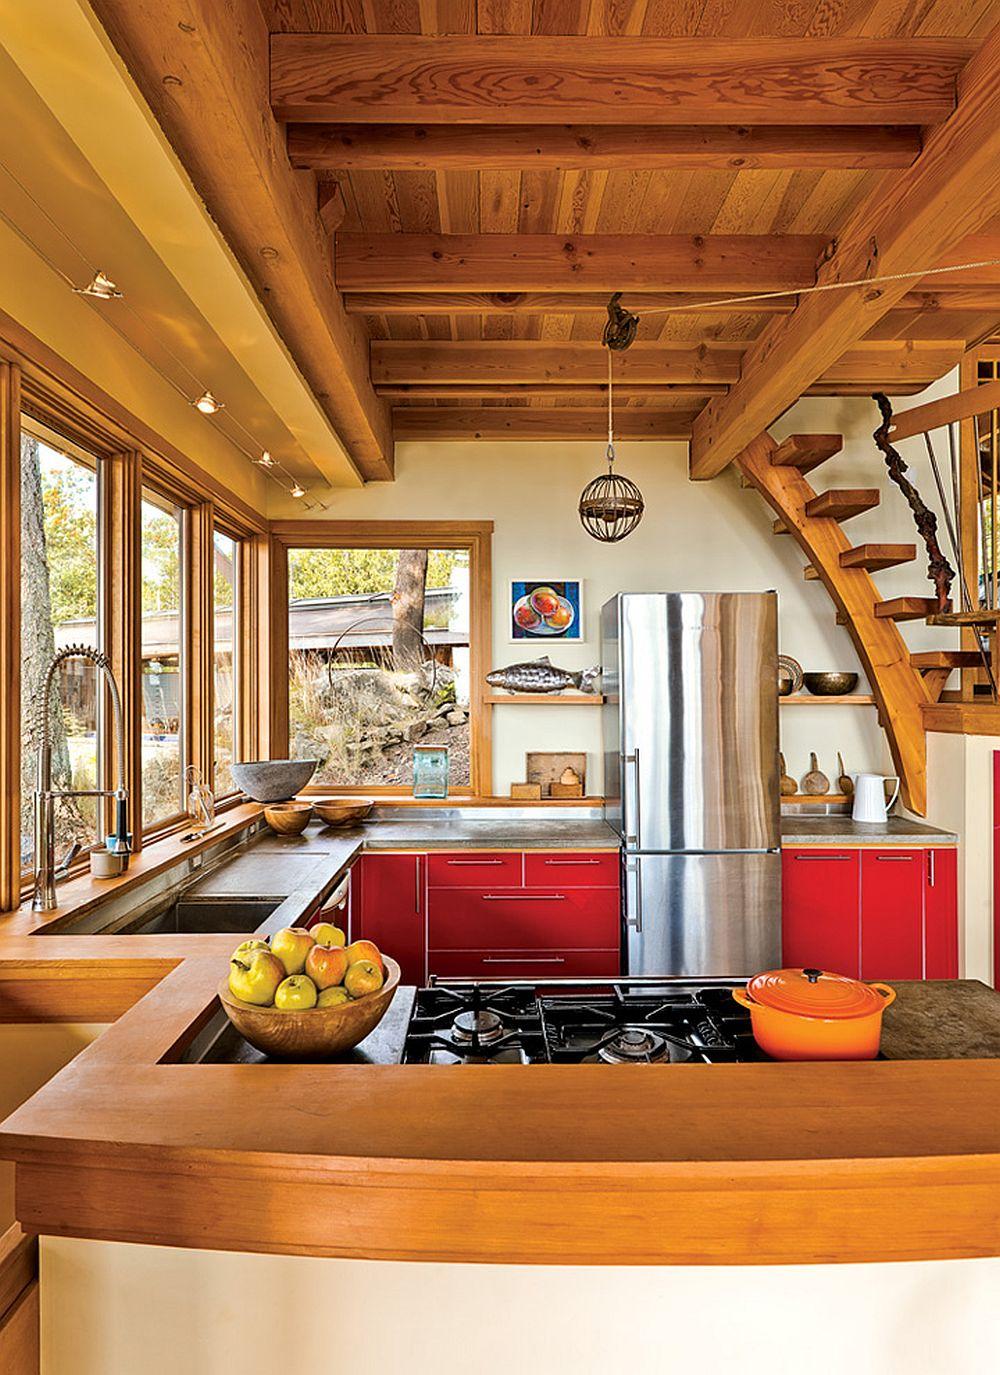 adelaparvu.com despre casa in Golf Georgia, design arh. Everest Lapp, Foto John Sinal (4)